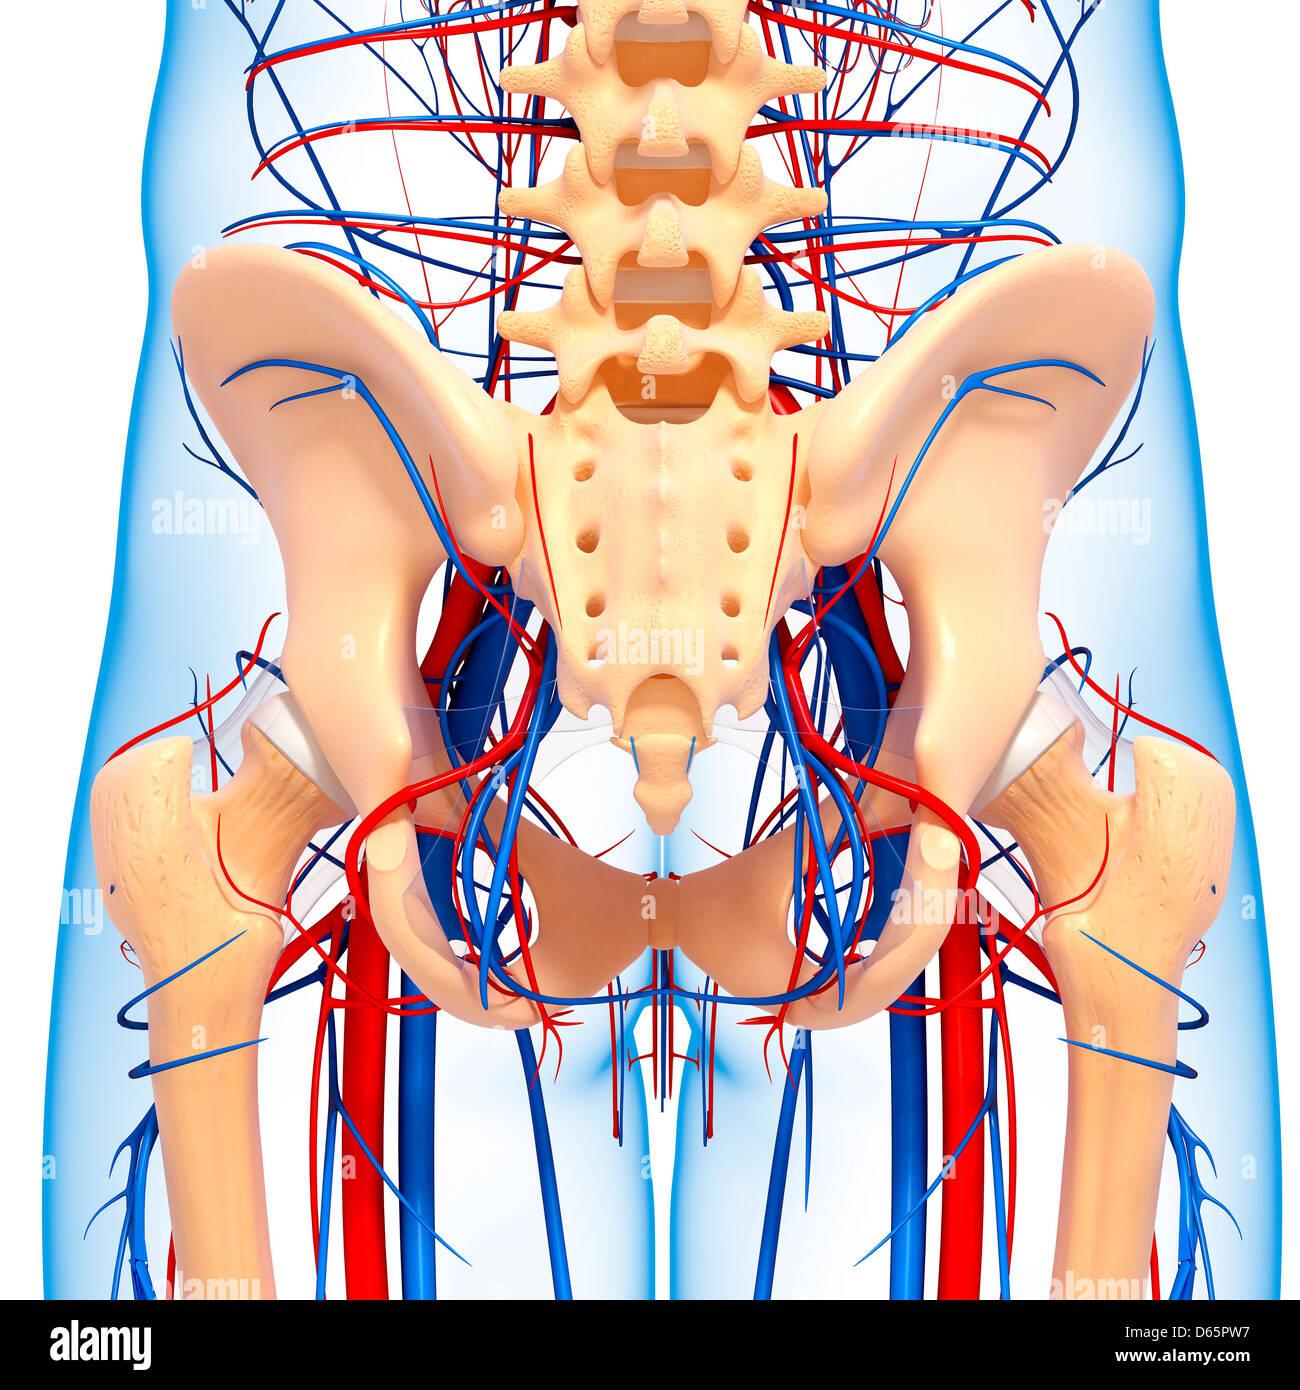 Pelvis anatomy, artwork - Stock Image